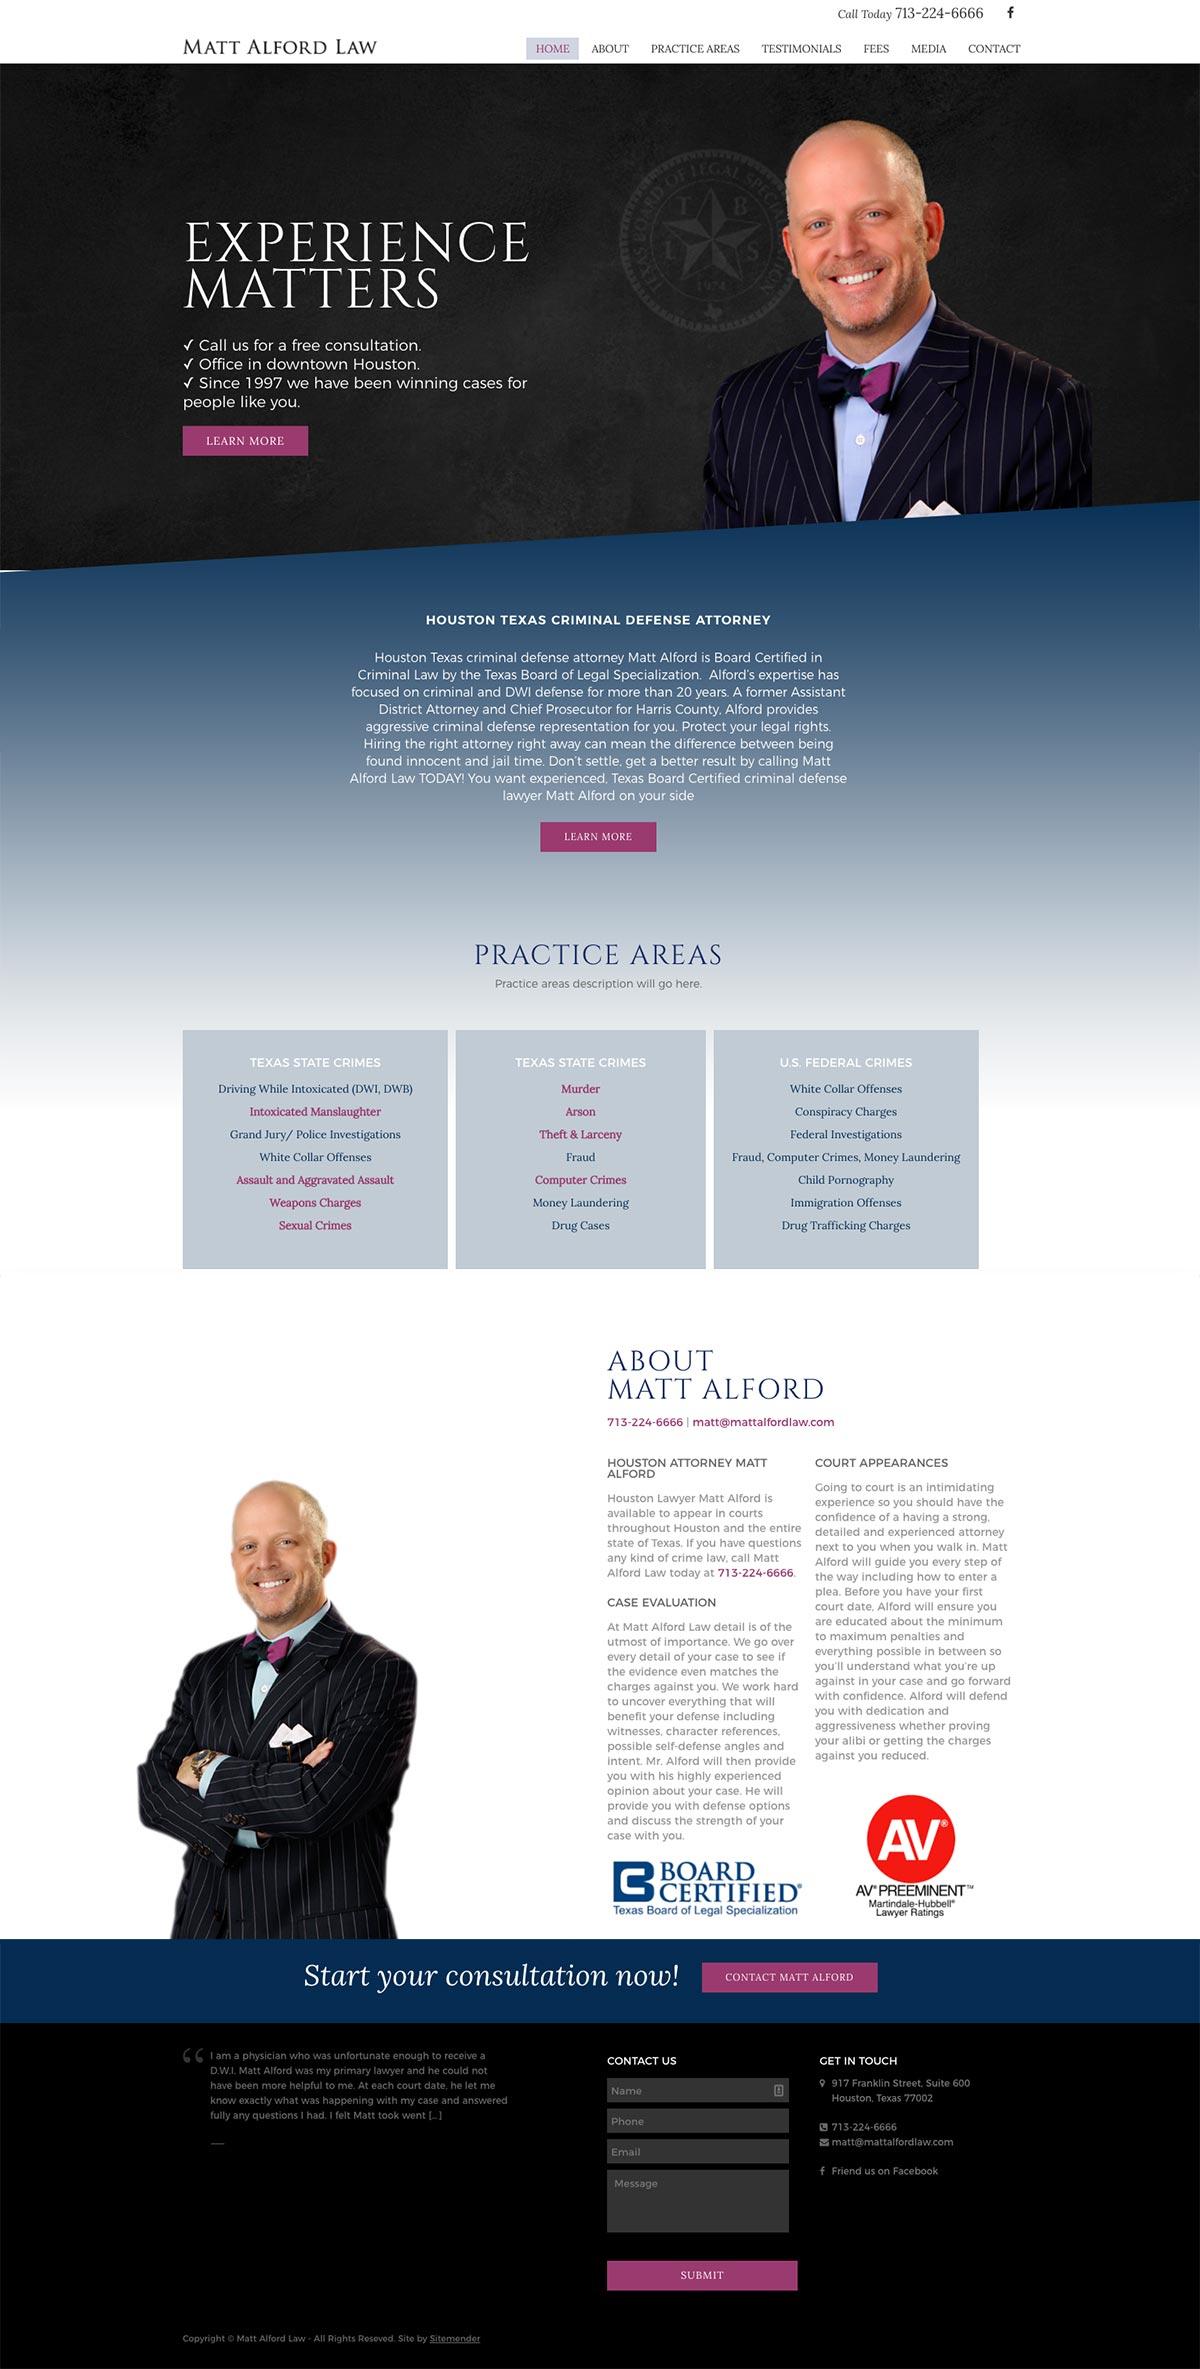 new Houston attorney website for Matt Alford Law